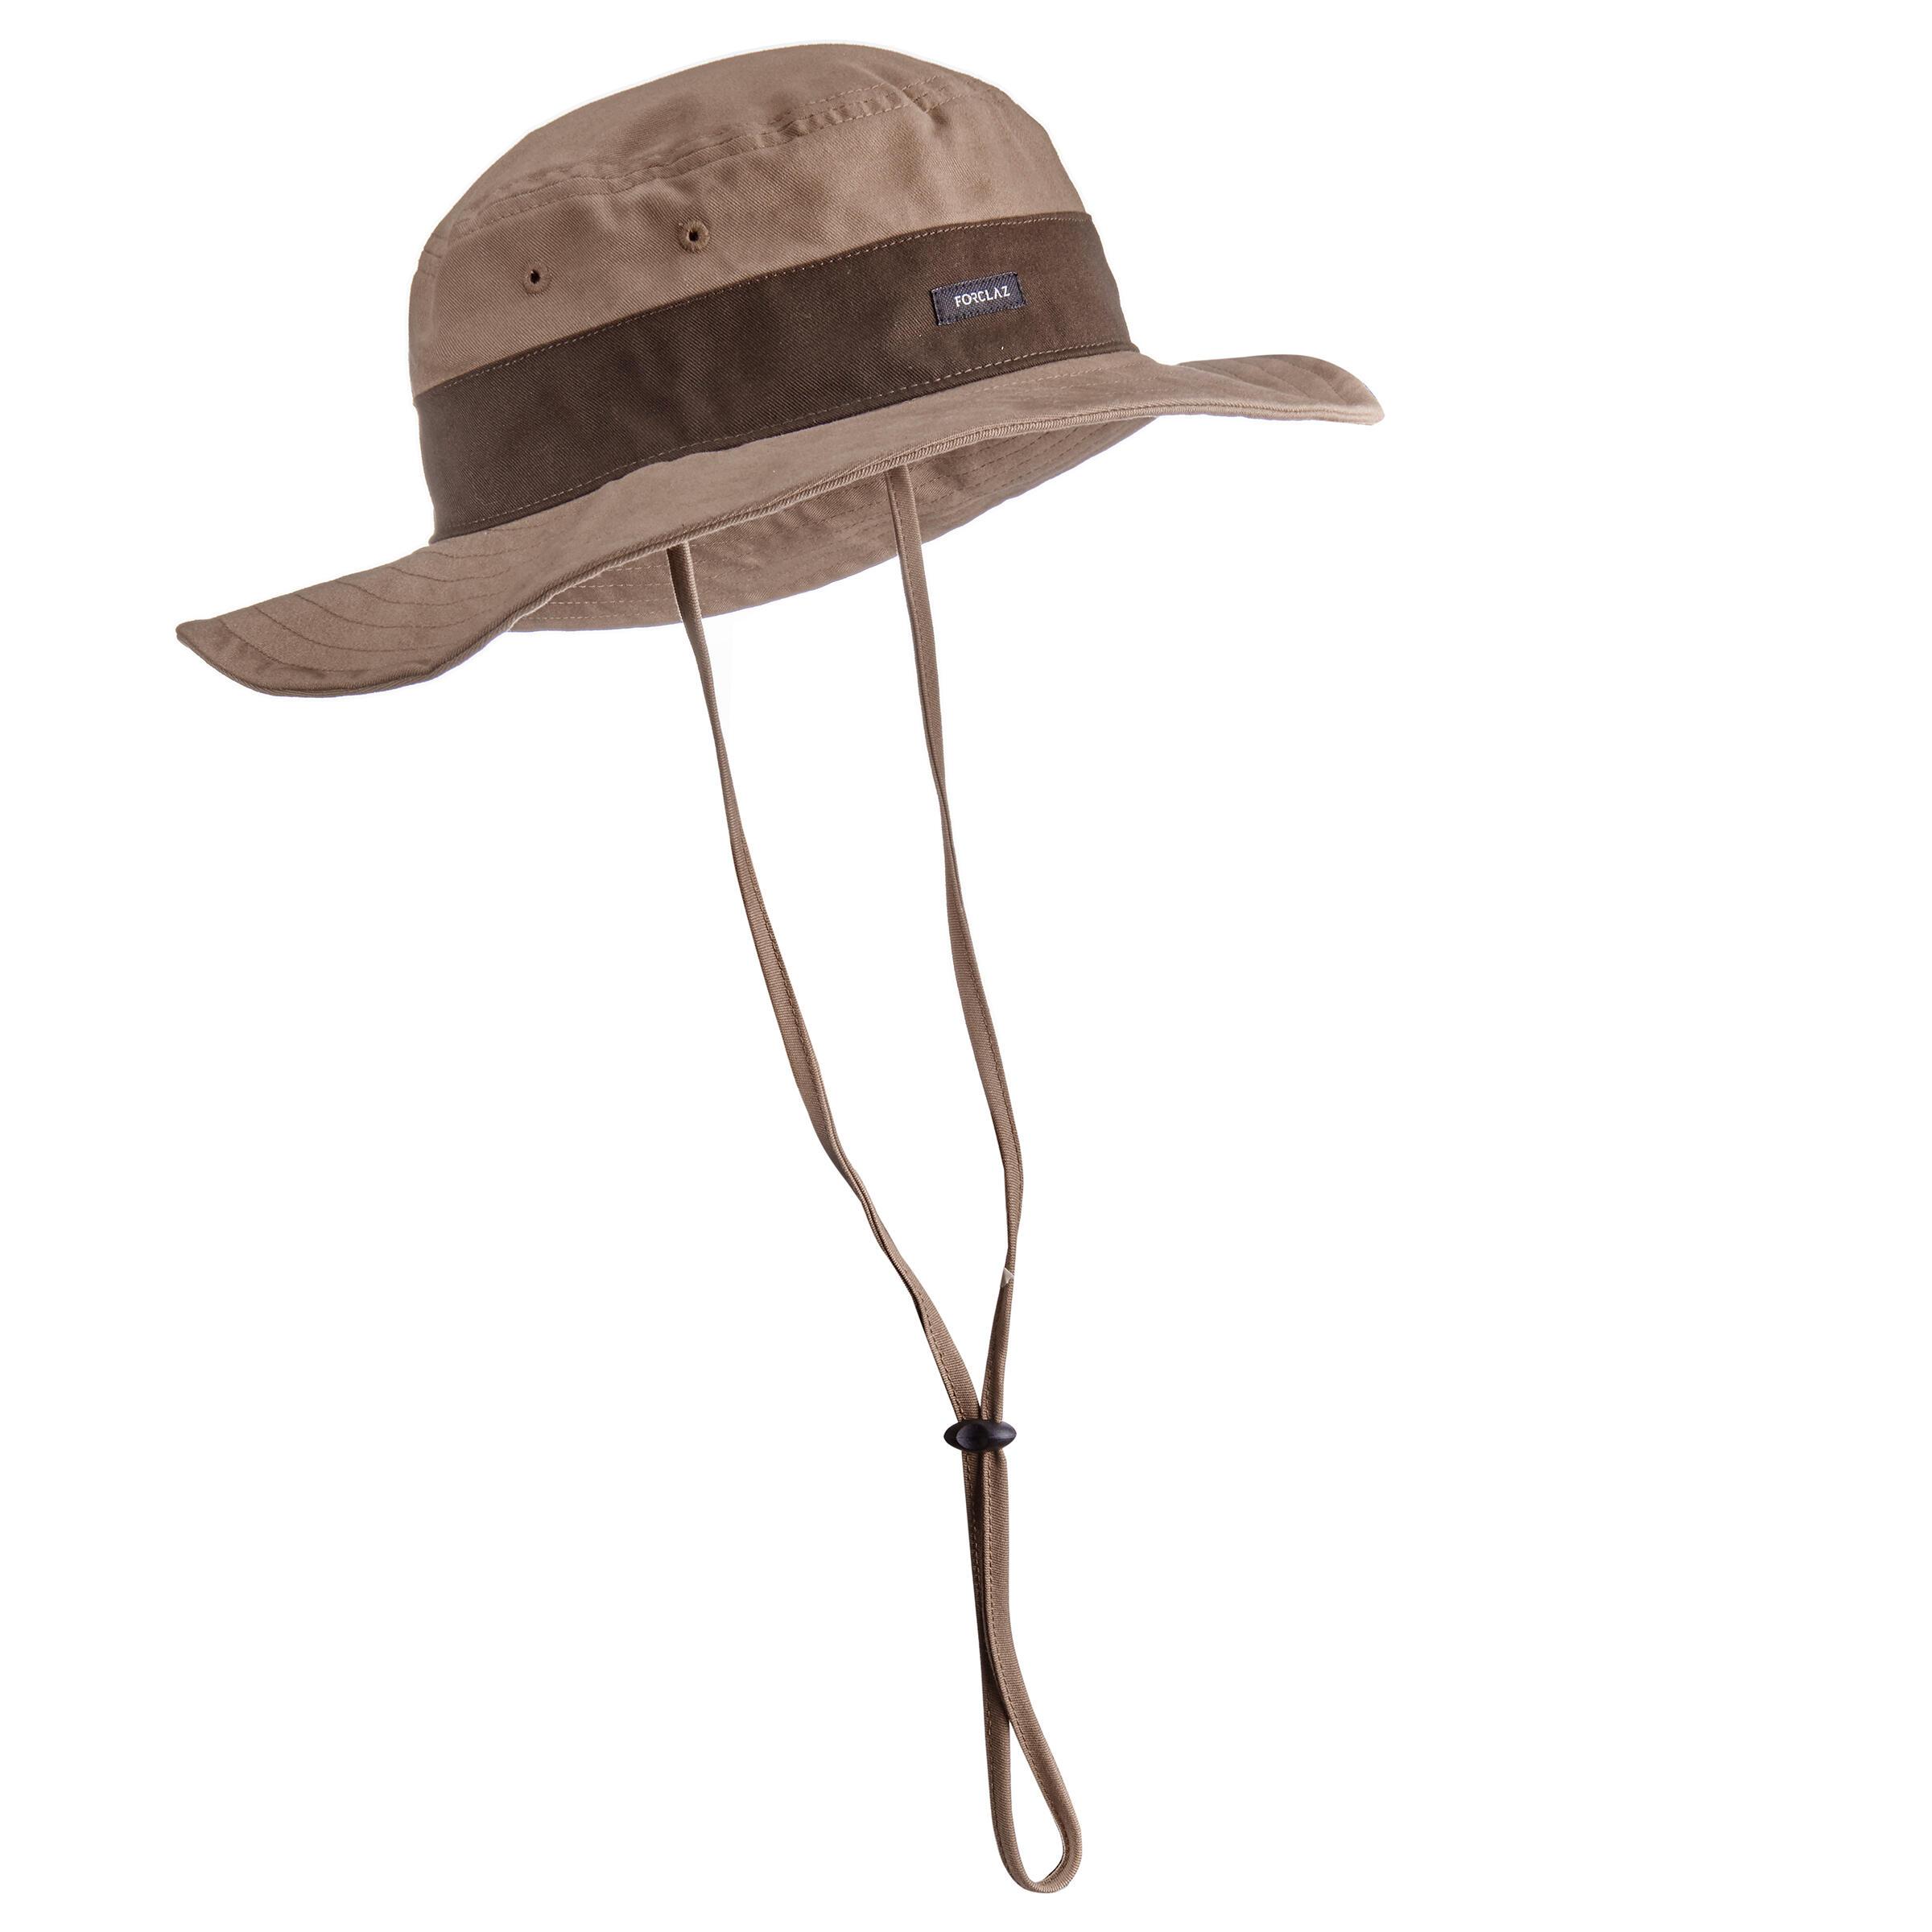 Sombrero de trekking en montaña TREK 100 marrón Forclaz  1c9da0c36f9